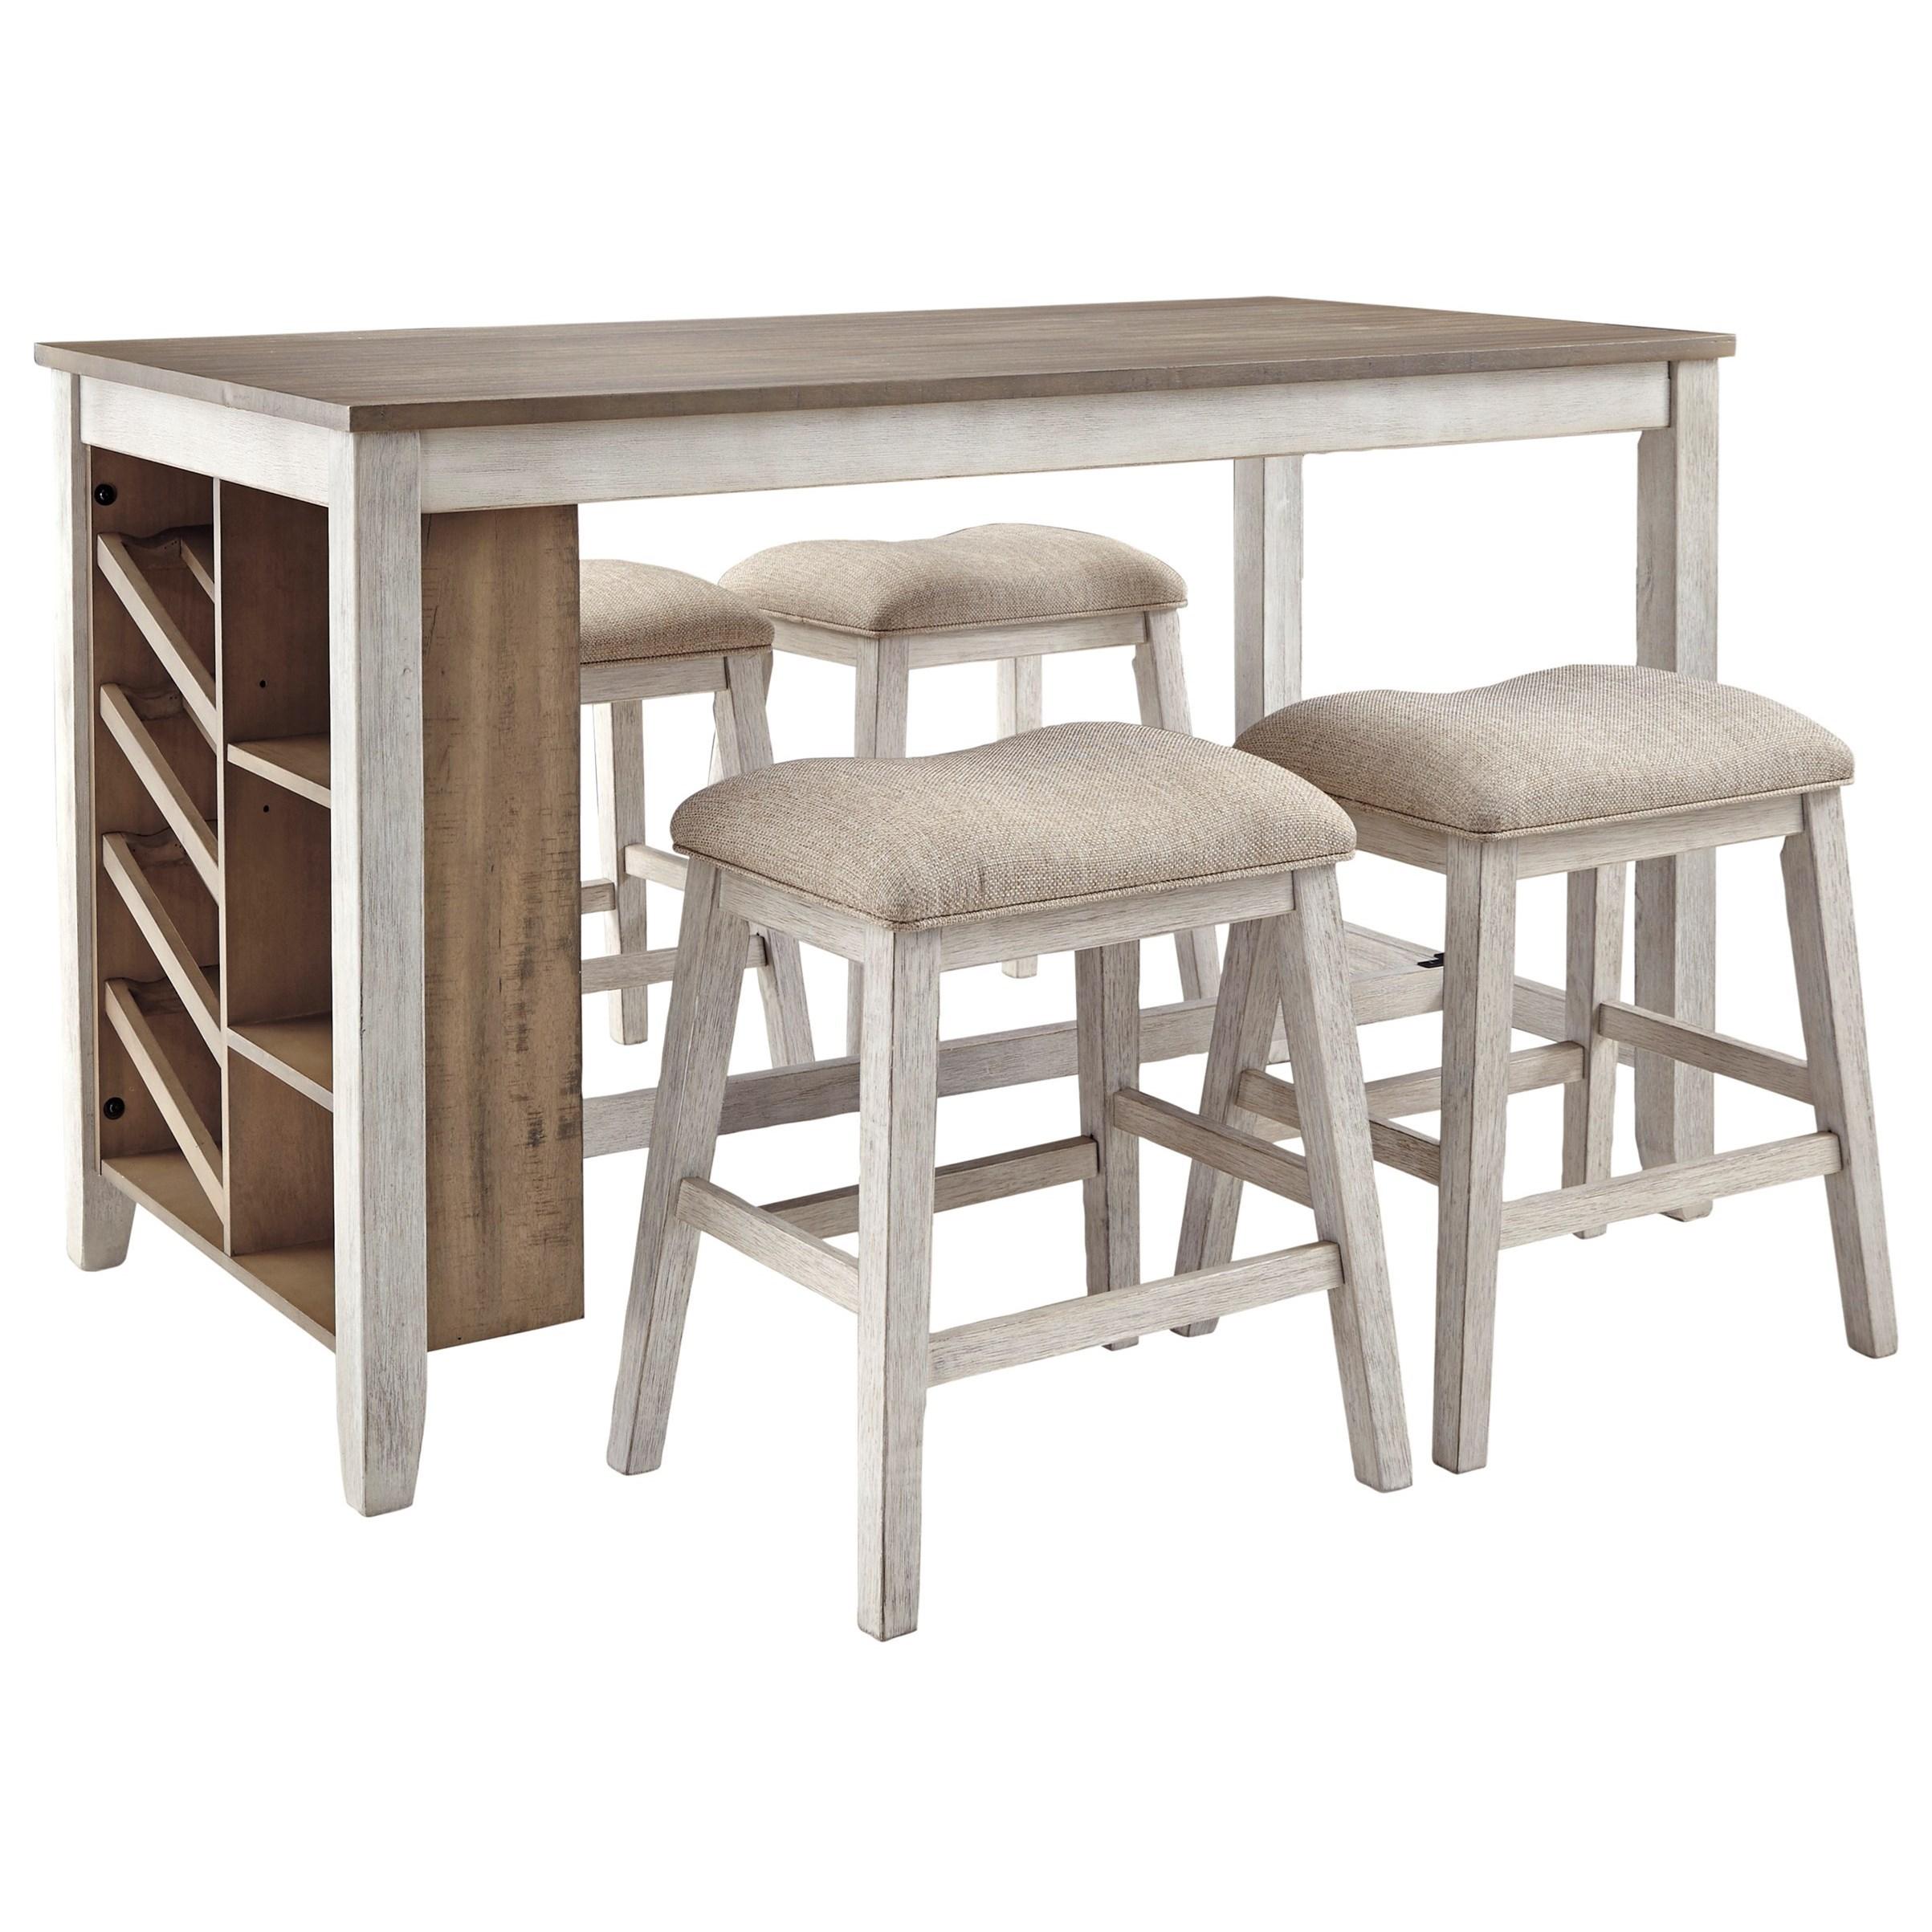 Skempton 5-Piece Rectangular Counter Table Set by Ashley (Signature Design) at Johnny Janosik